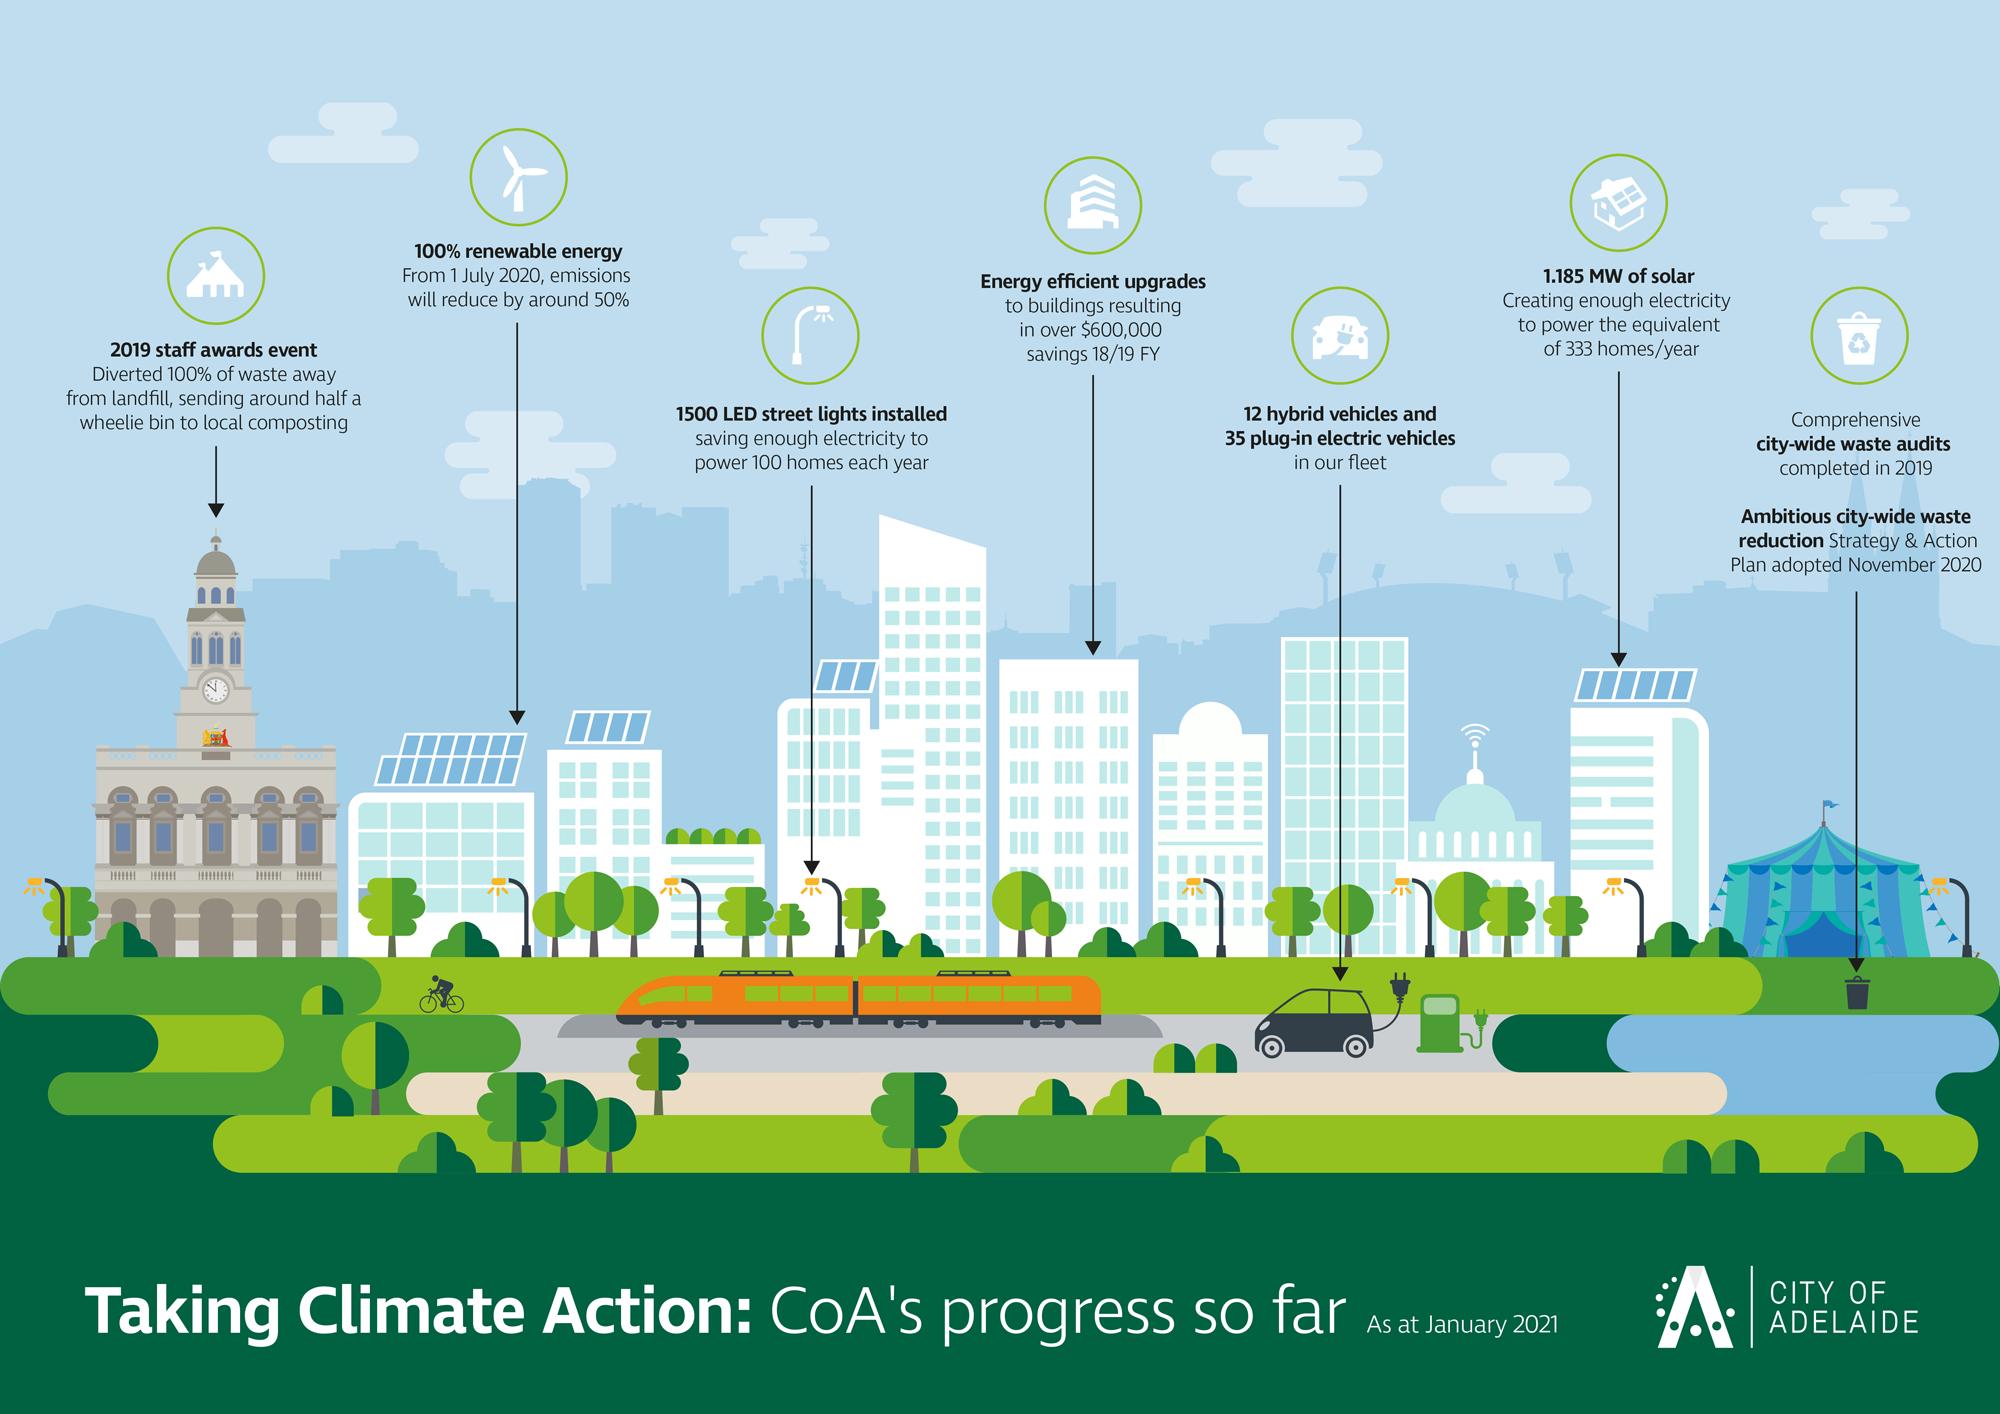 Sustainability achievements diagram